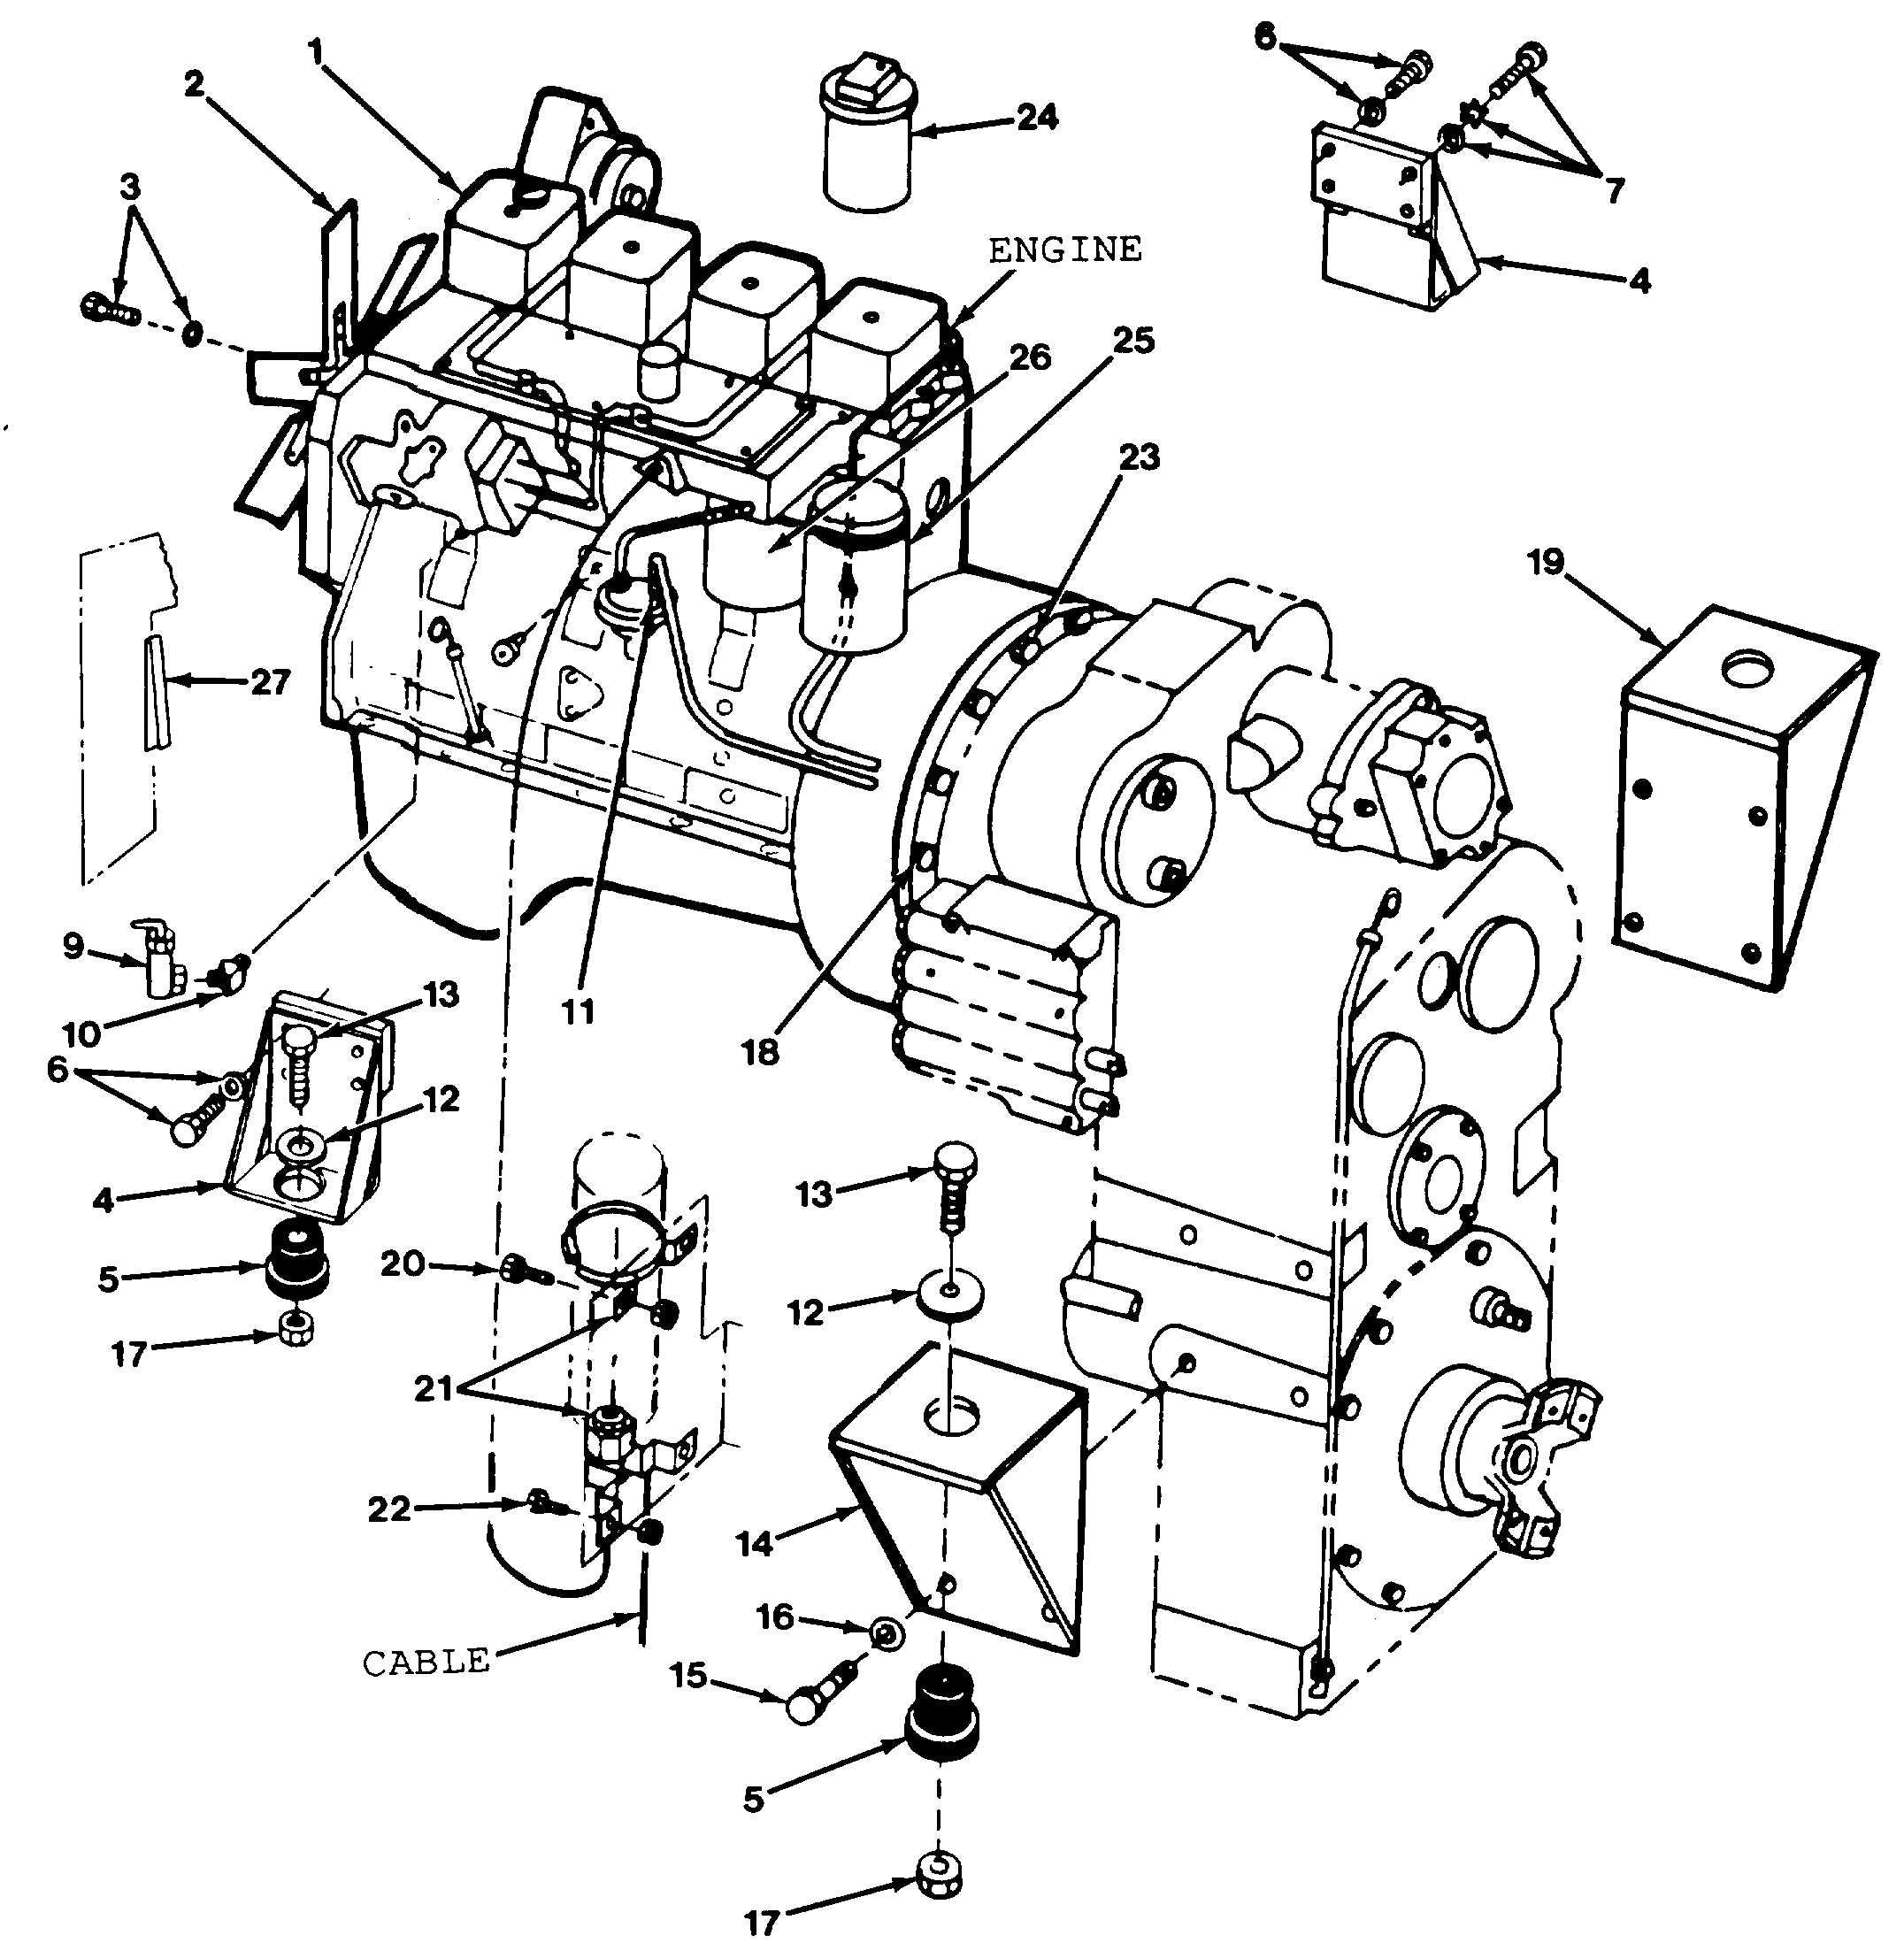 track and field diagram danfoss s plan plus wiring electrical motors basic ponents imageresizertool com